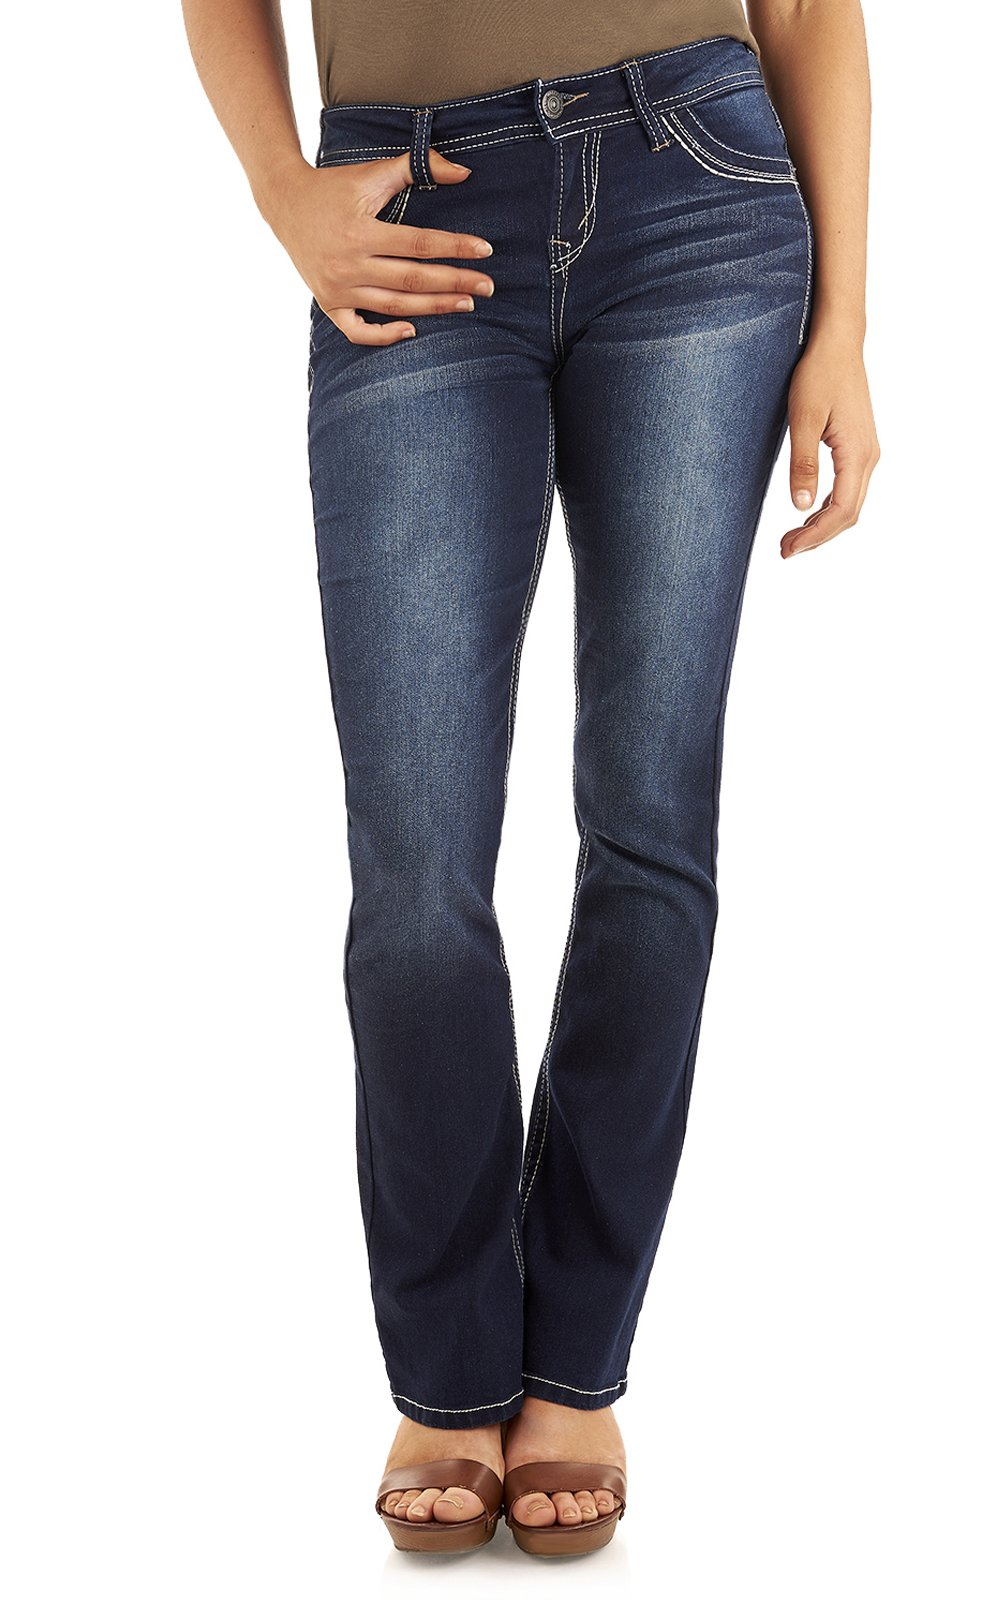 a2fa6dc064301 Galleon - WallFlower Women s Juniors Classic Legendary Stretch Bootcut  Denim Jeans In Amy